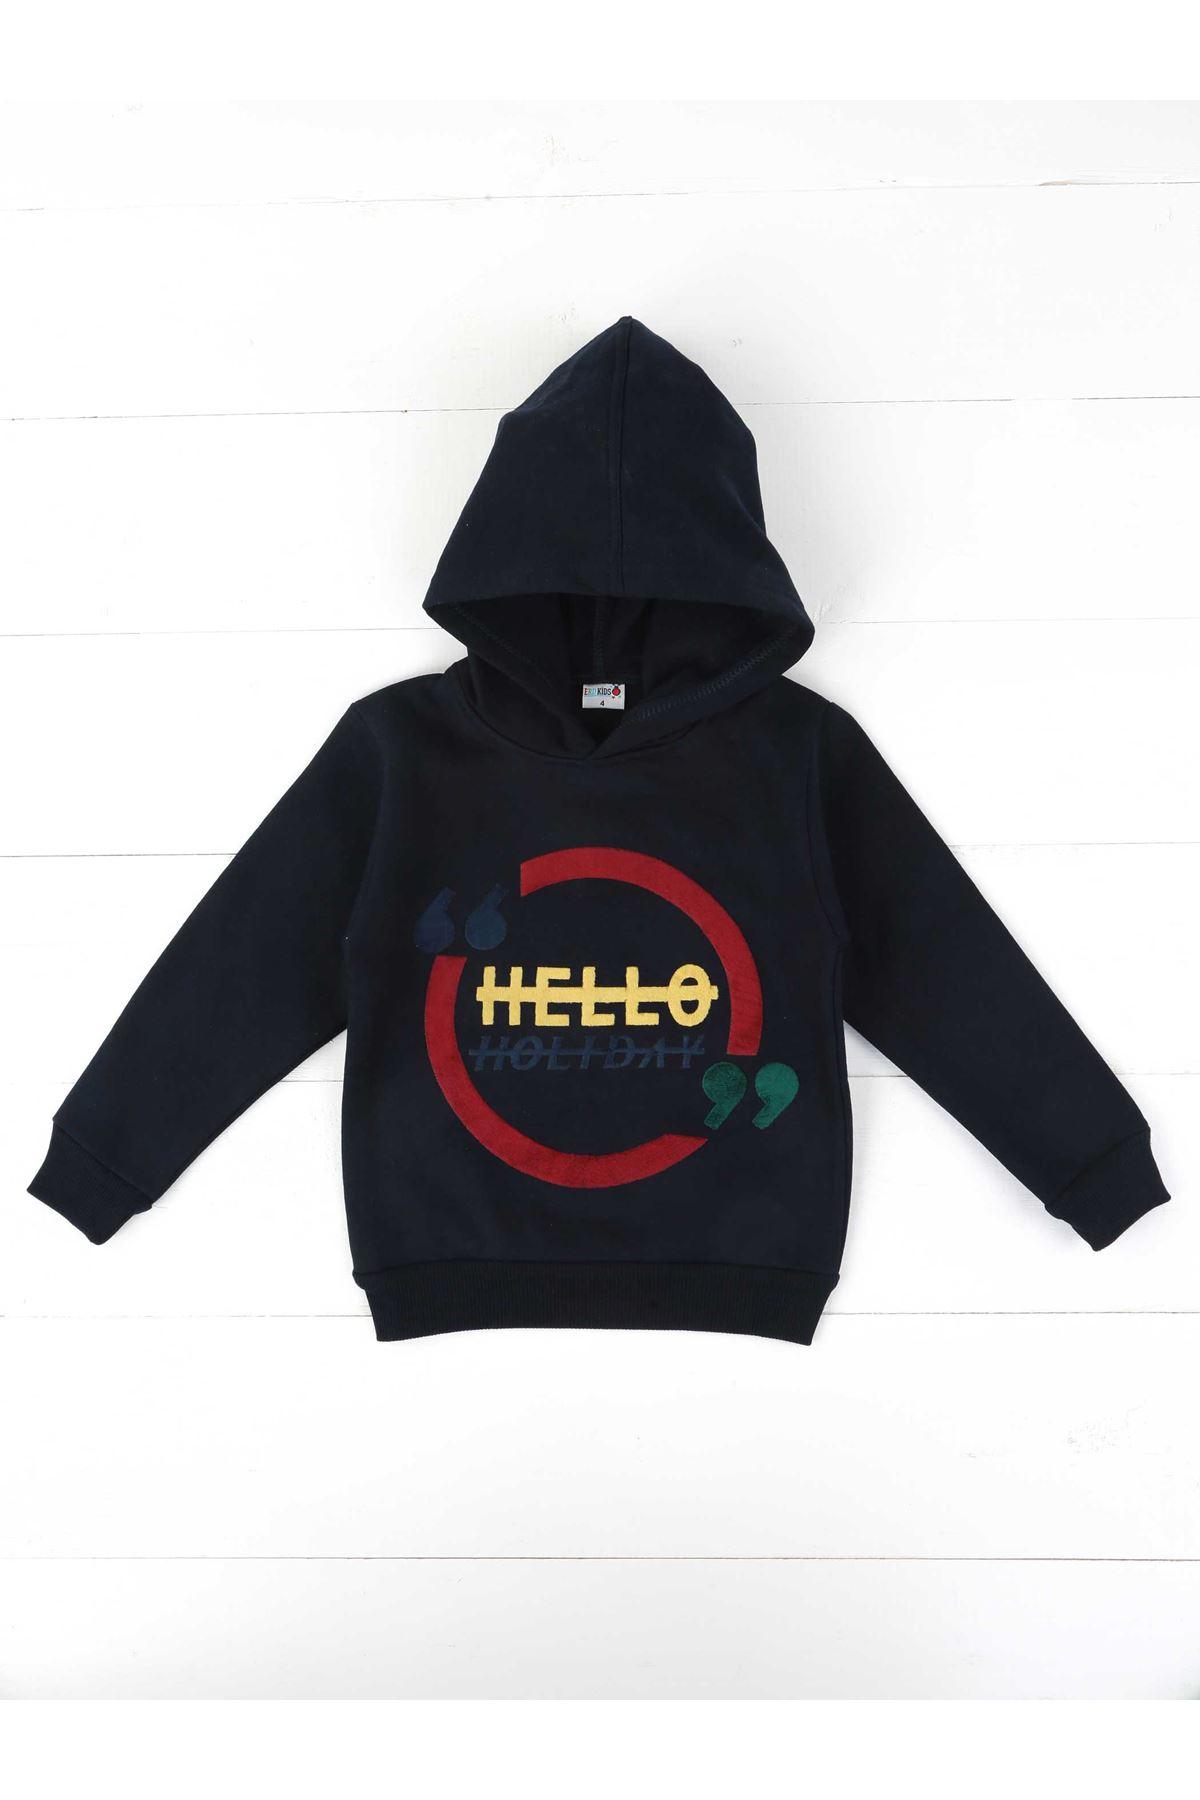 Navy Blue Hooded Seasonal Male Child Sweatshirt